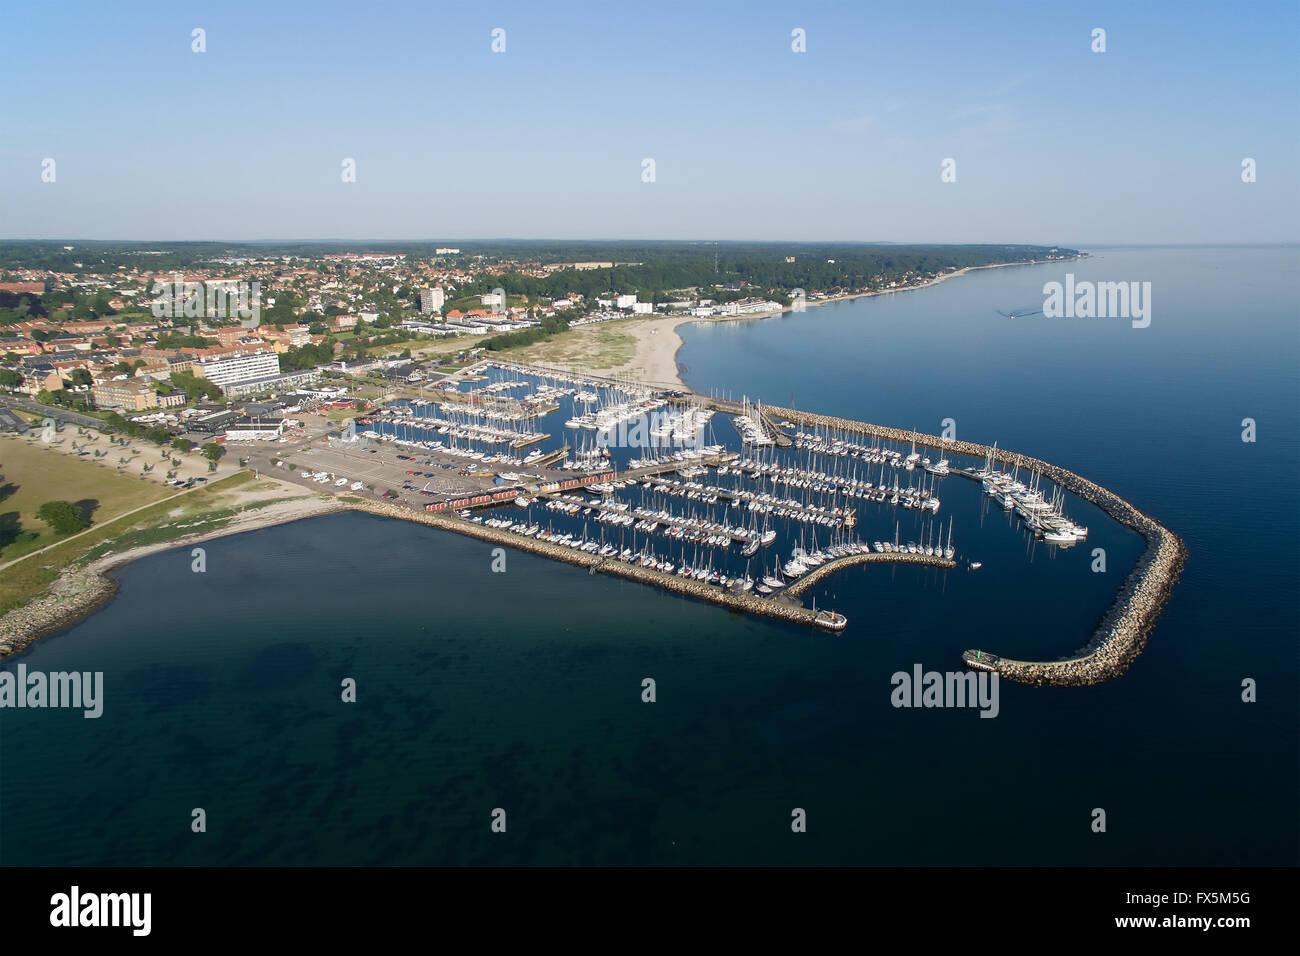 Aerial view of Helsingoer harbour located in zealand, Denmark - Stock Image